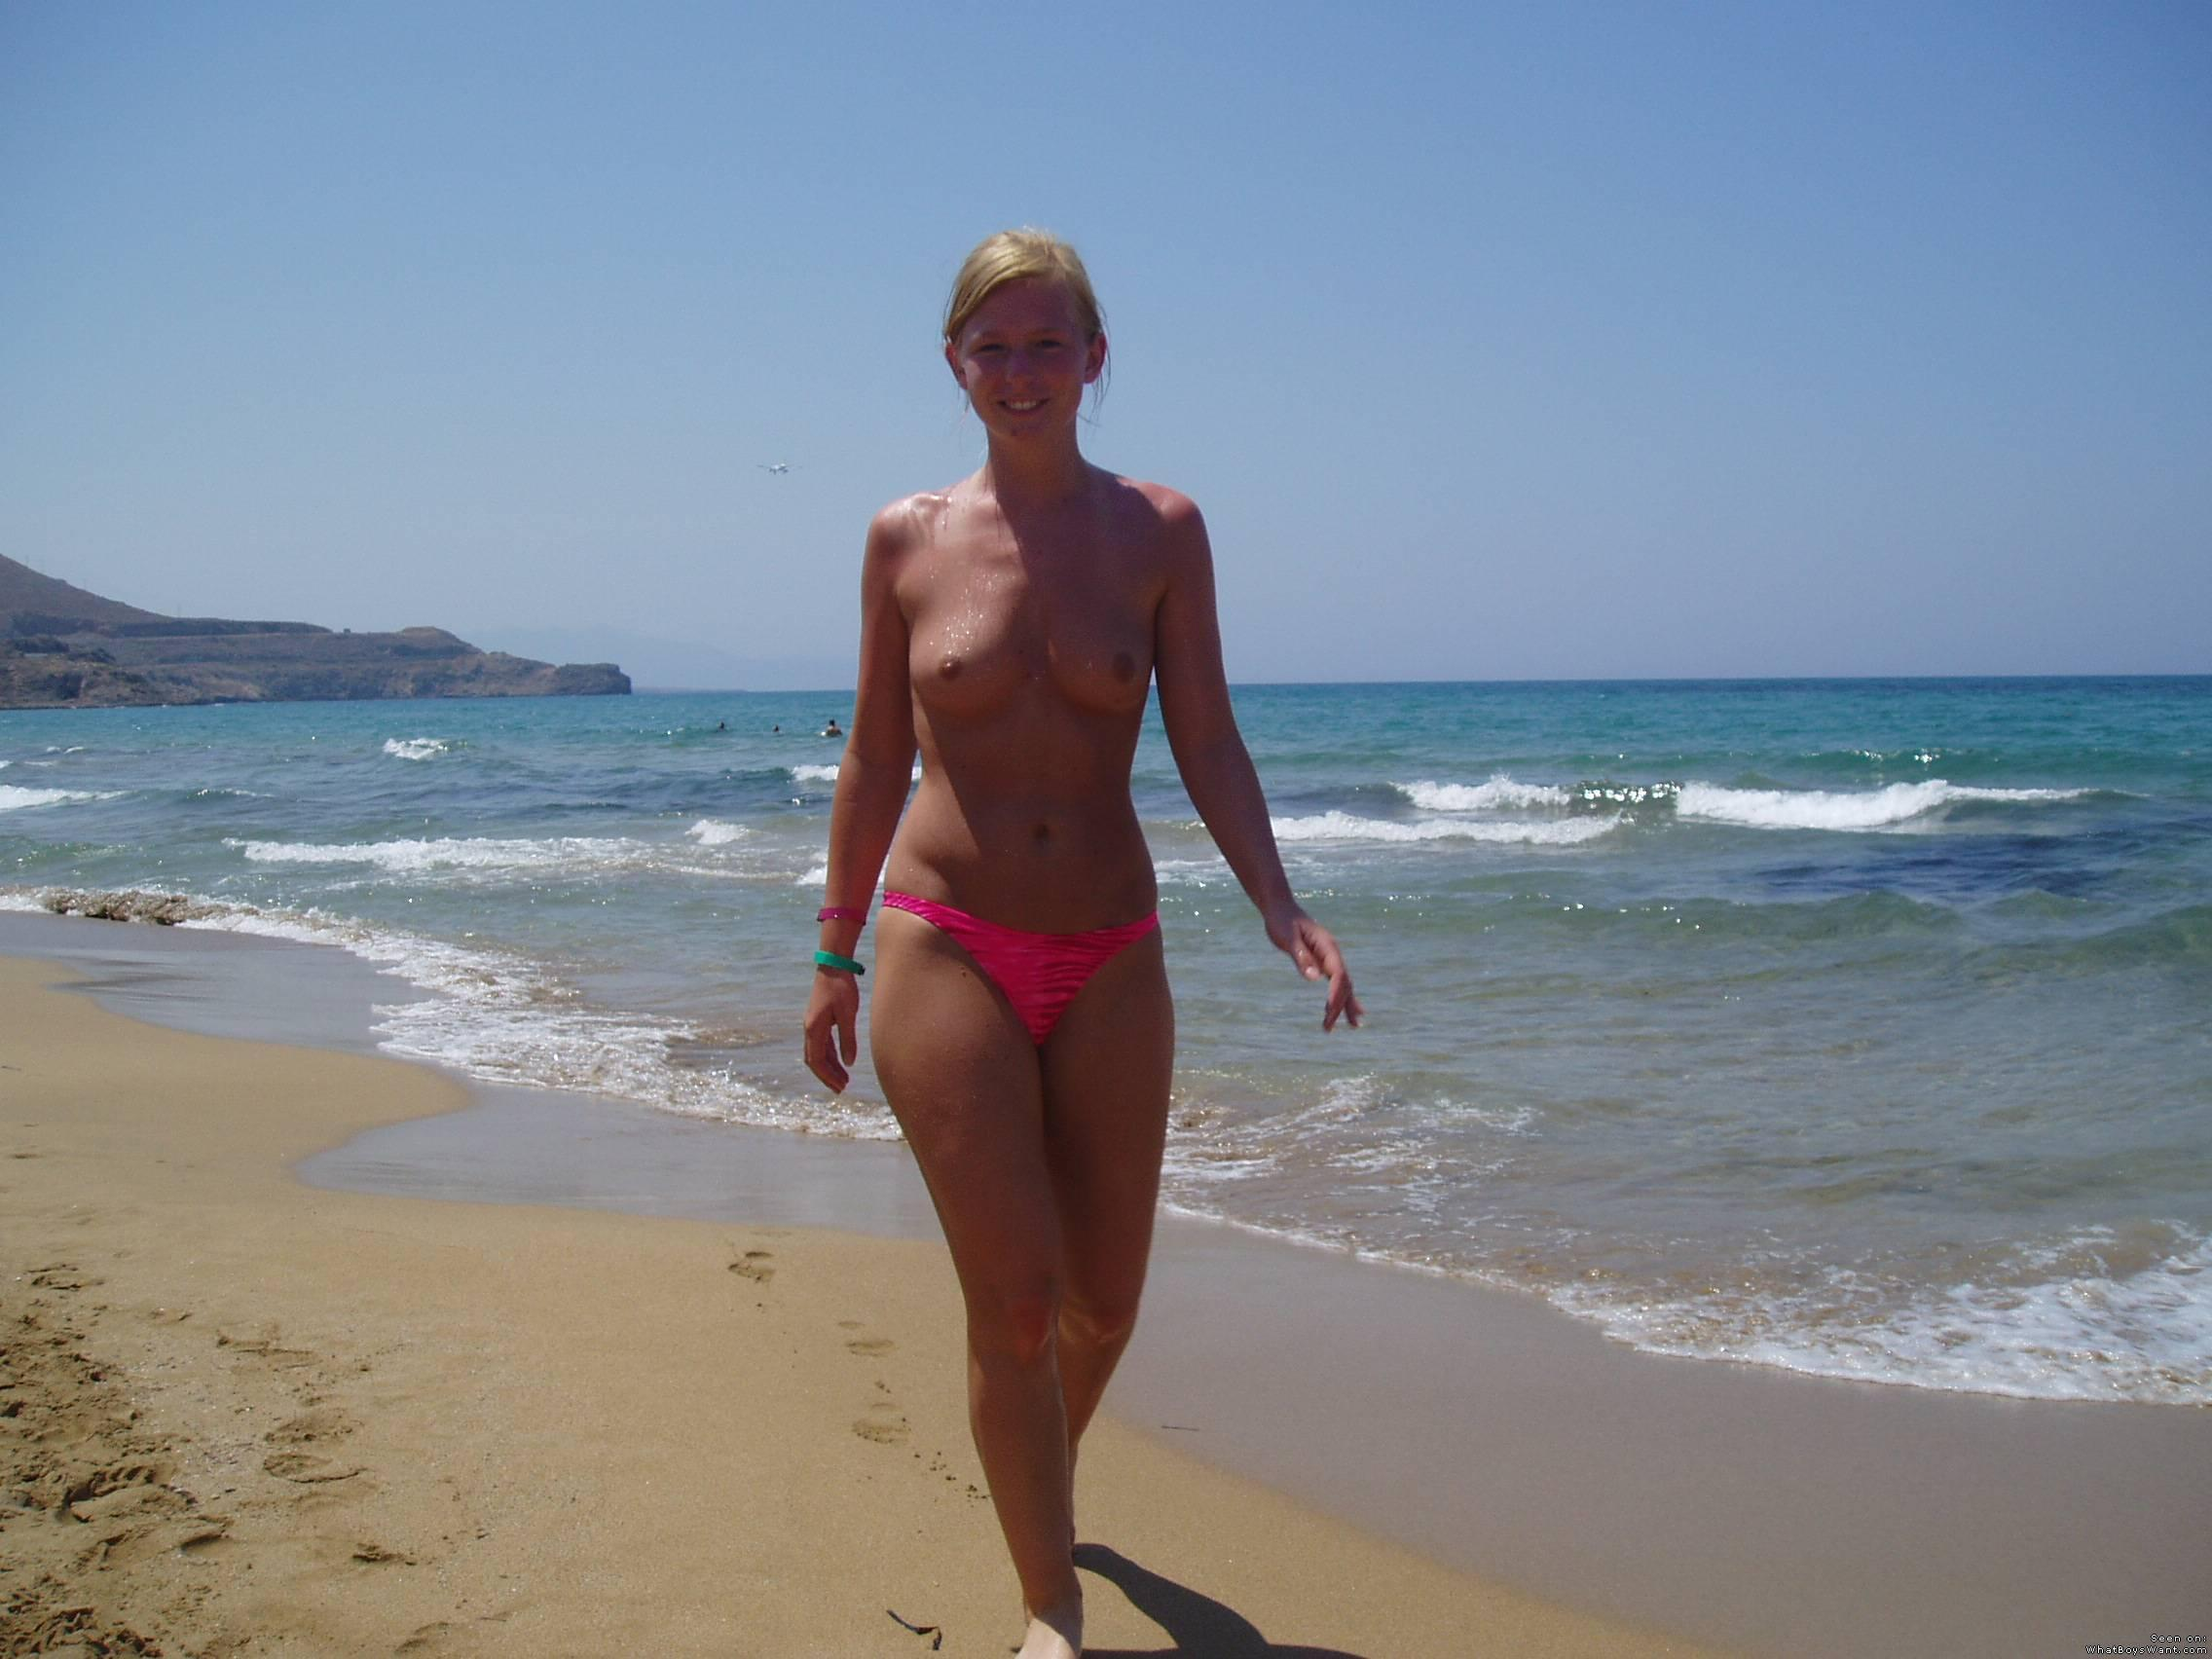 Topless pretty girl walking on the beach in her pink bikinis